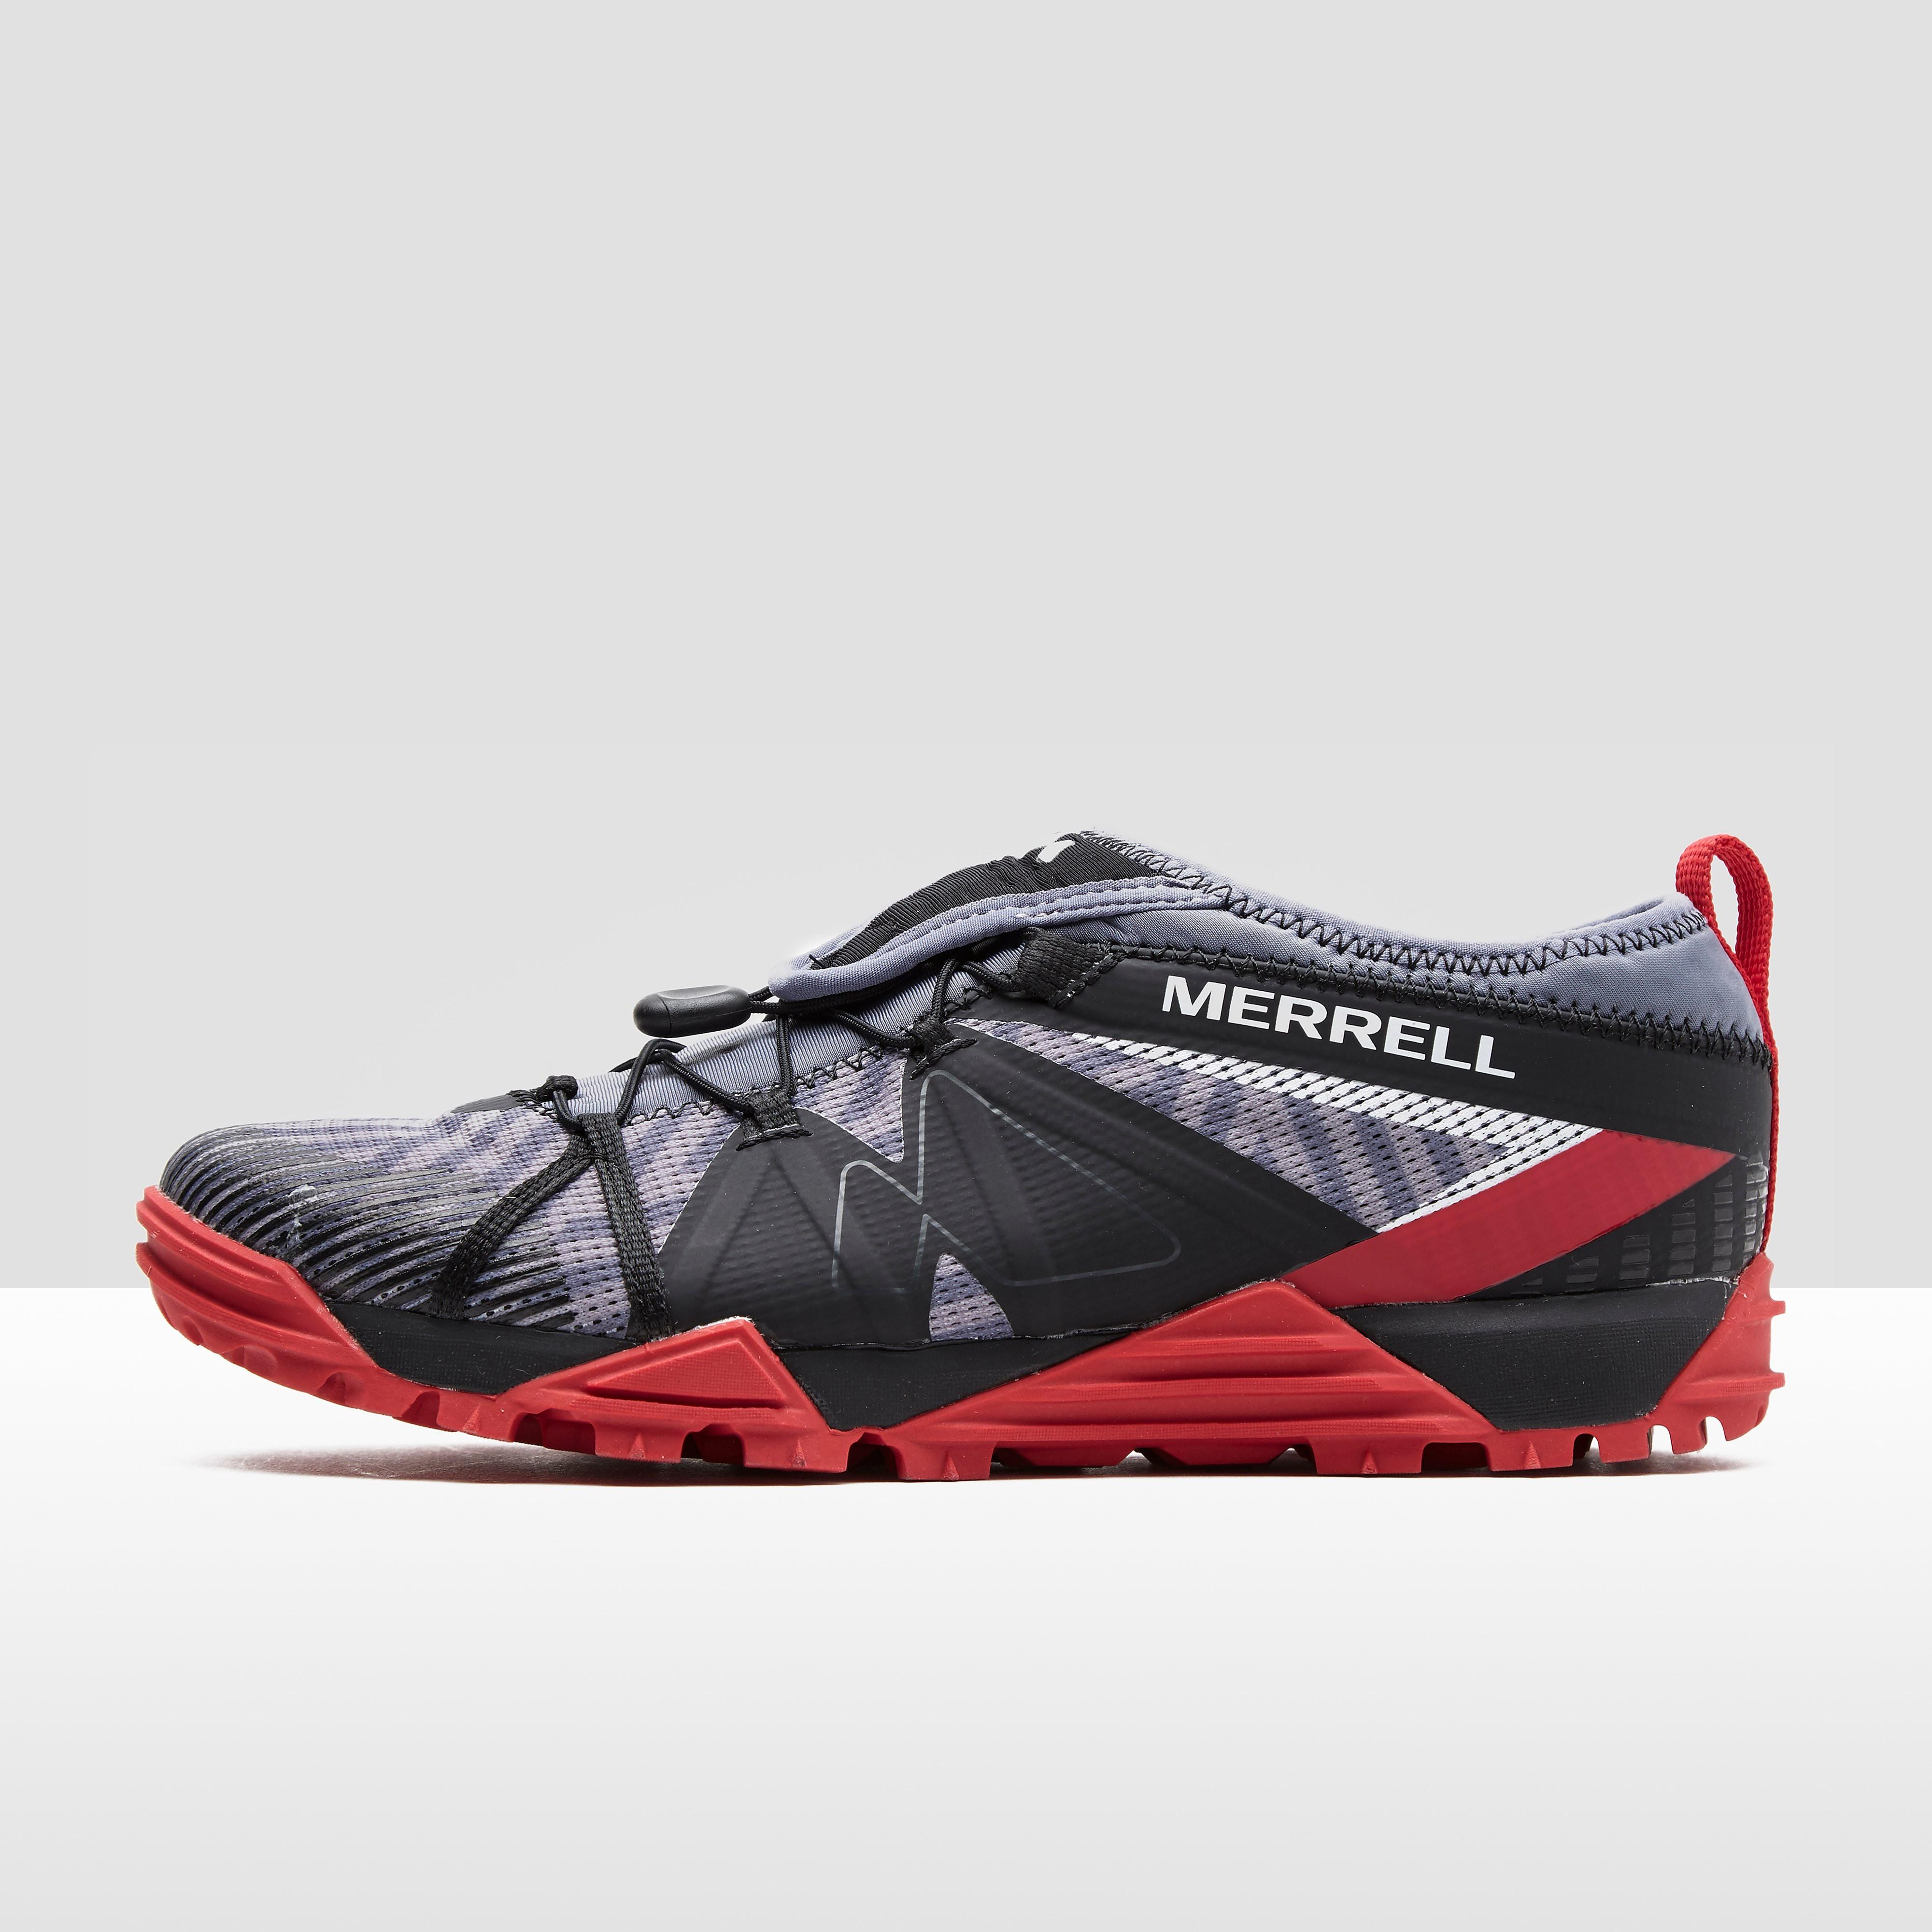 Merrell Avalaunch Women's Trail Running Shoes